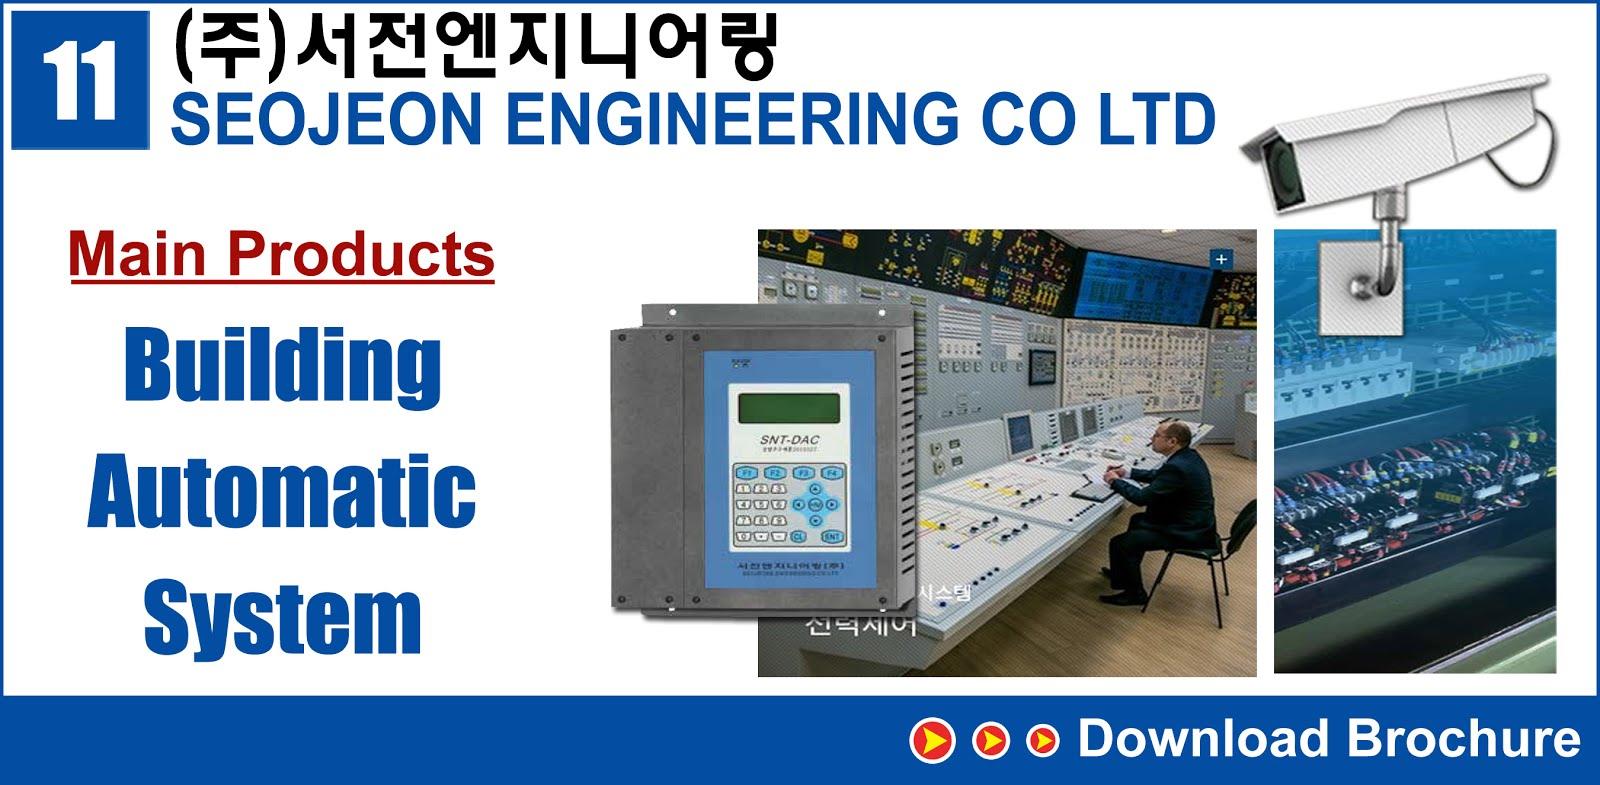 11.SEOJEON ENGINEERING CO LTD